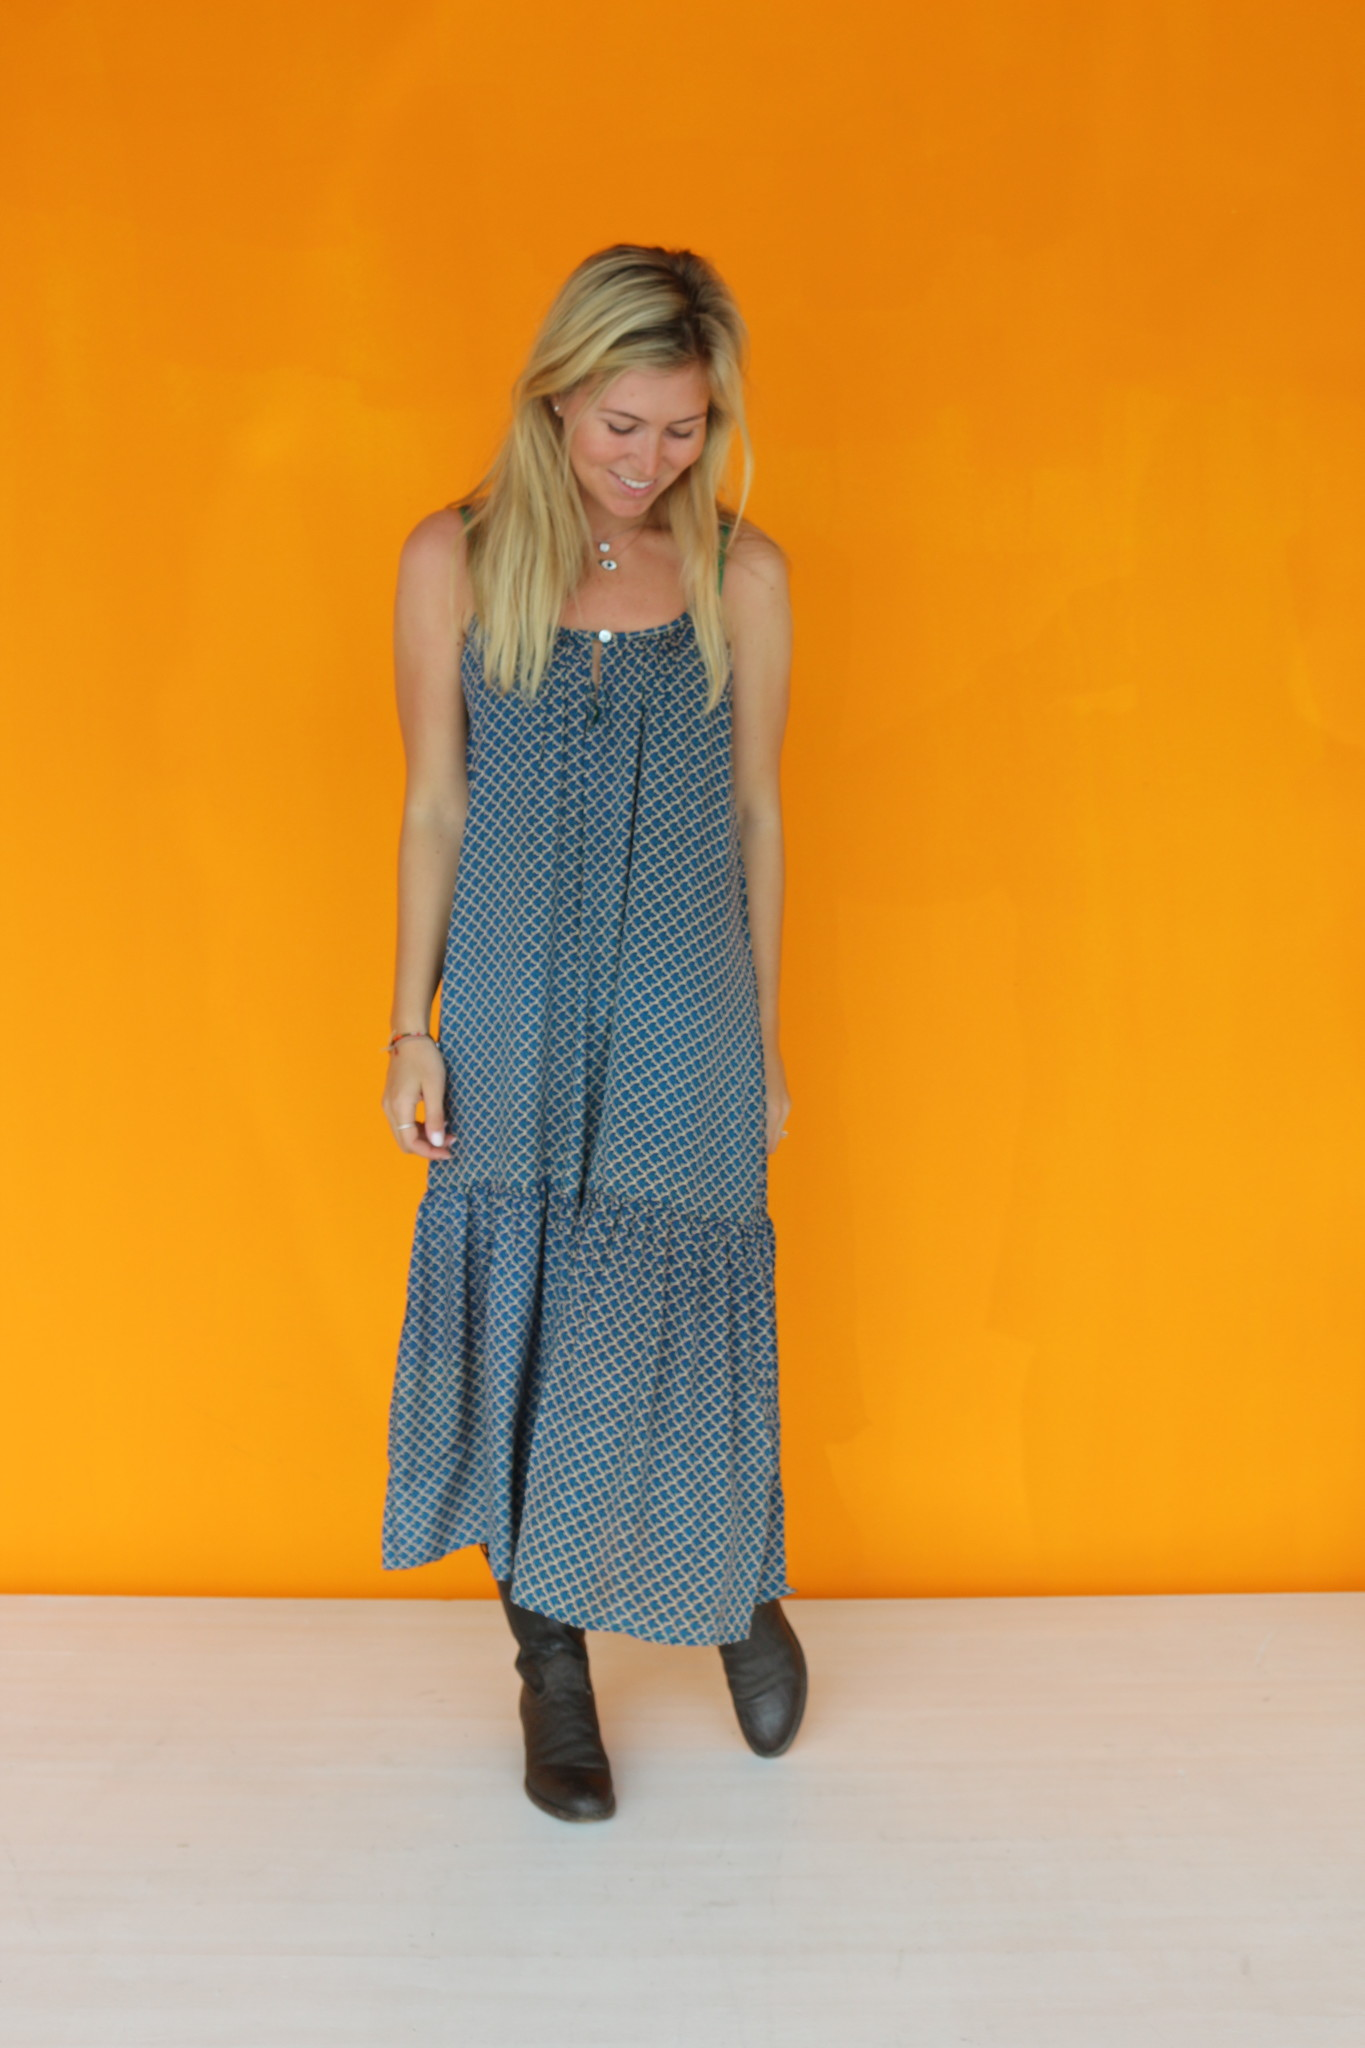 SISSEL EDELBO AFFECTION STRAP DRESS VAN SISSEL EDELBO NO.4